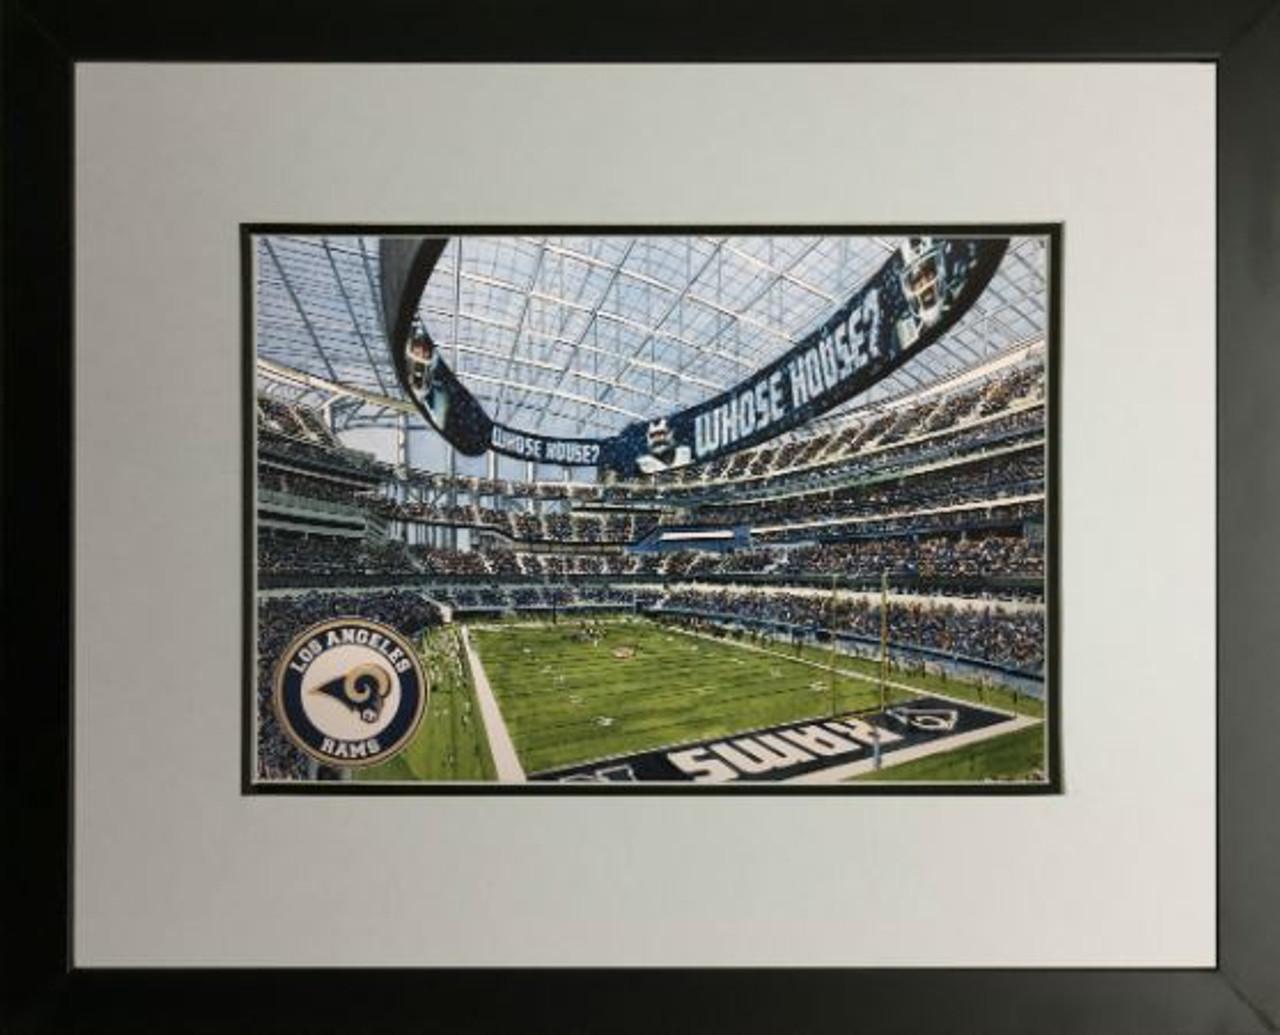 SOFI Stadium - Los Angeles Rams  Art Print